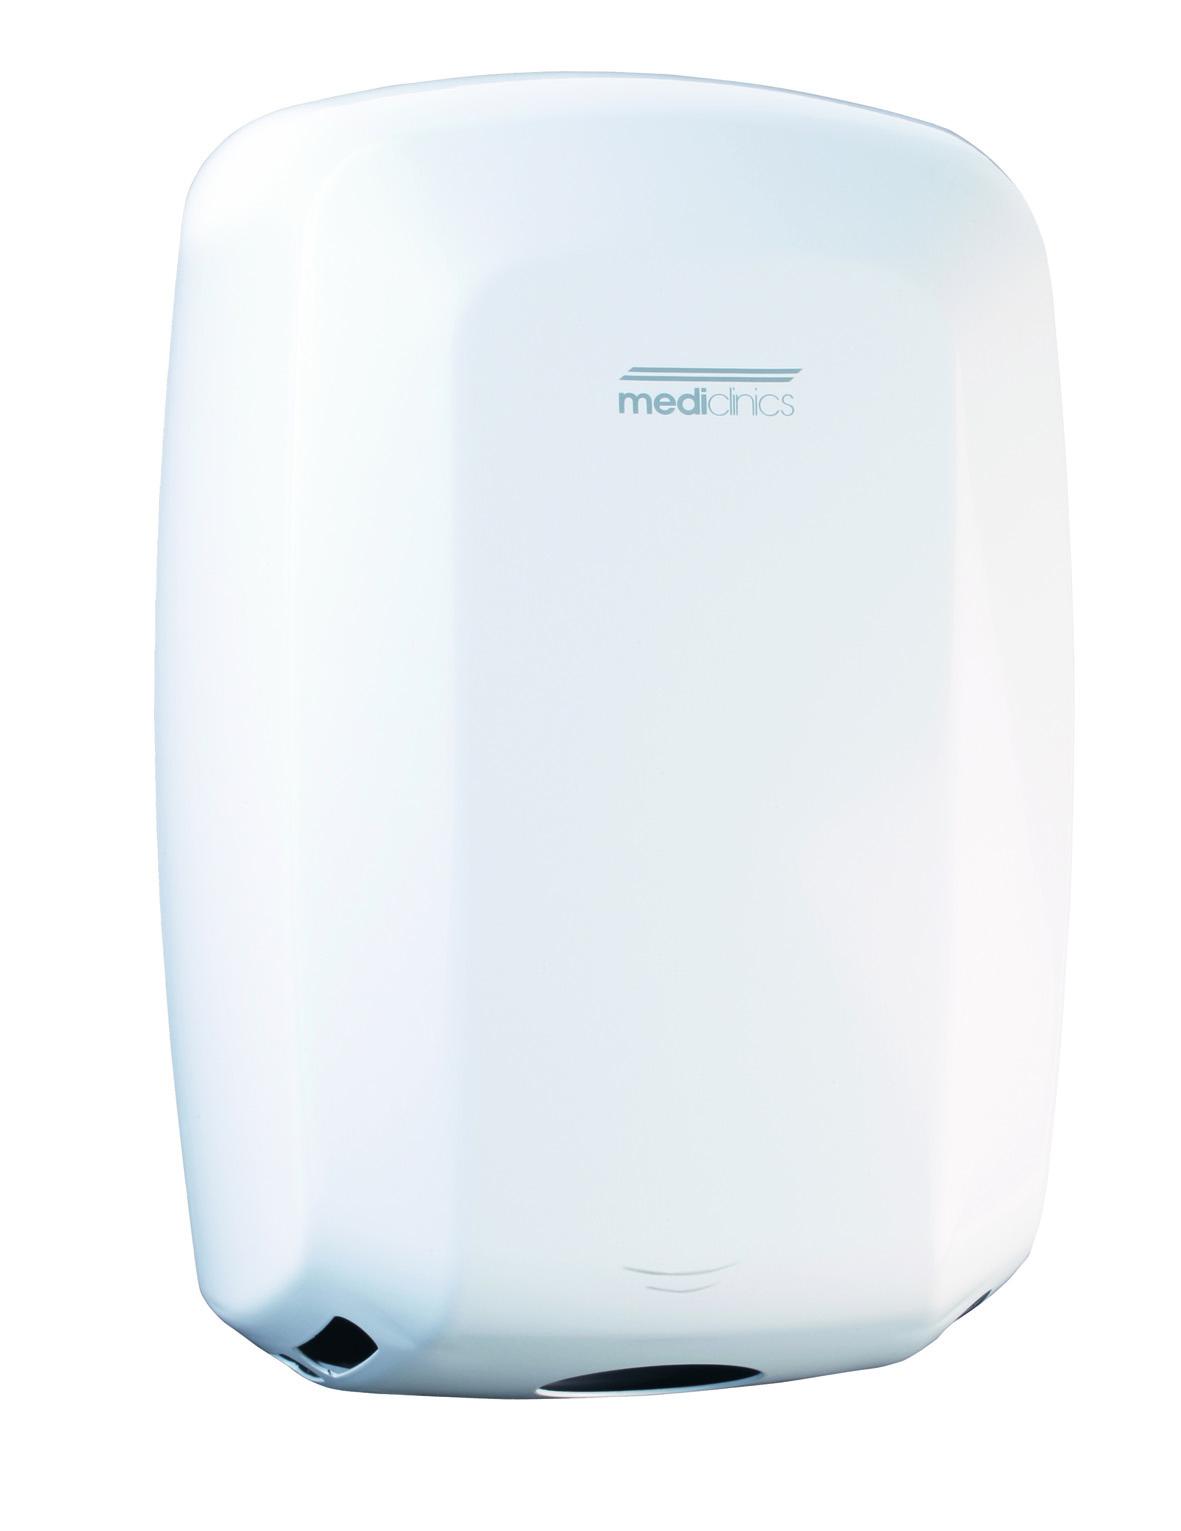 Valge kätekuivati (Sensoriga Mediclinics Machflow® 325km/h)